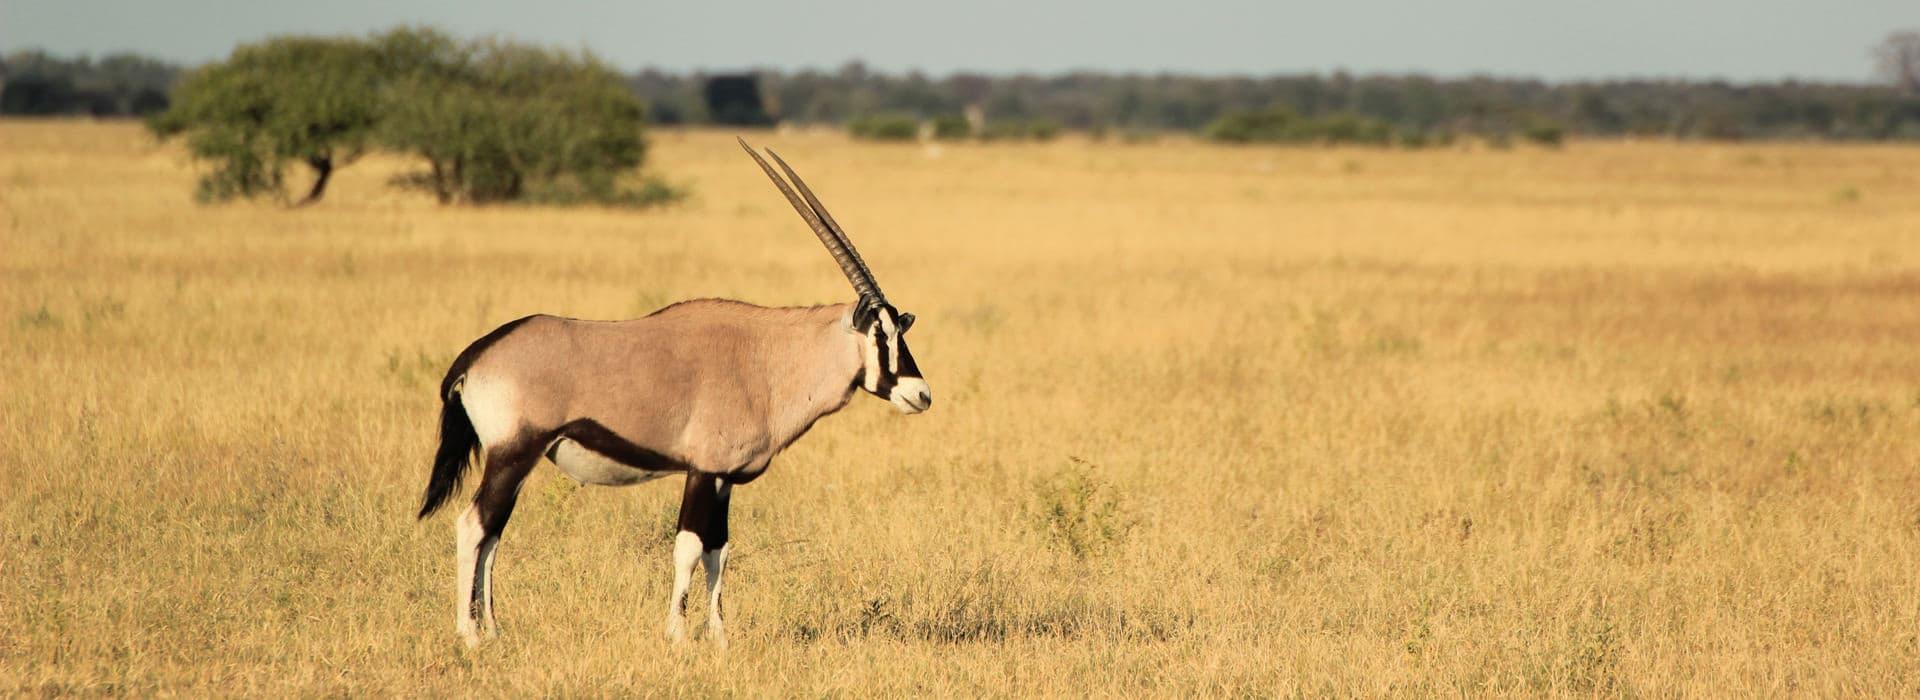 Makgadikgadi & Nxai Pan National Park